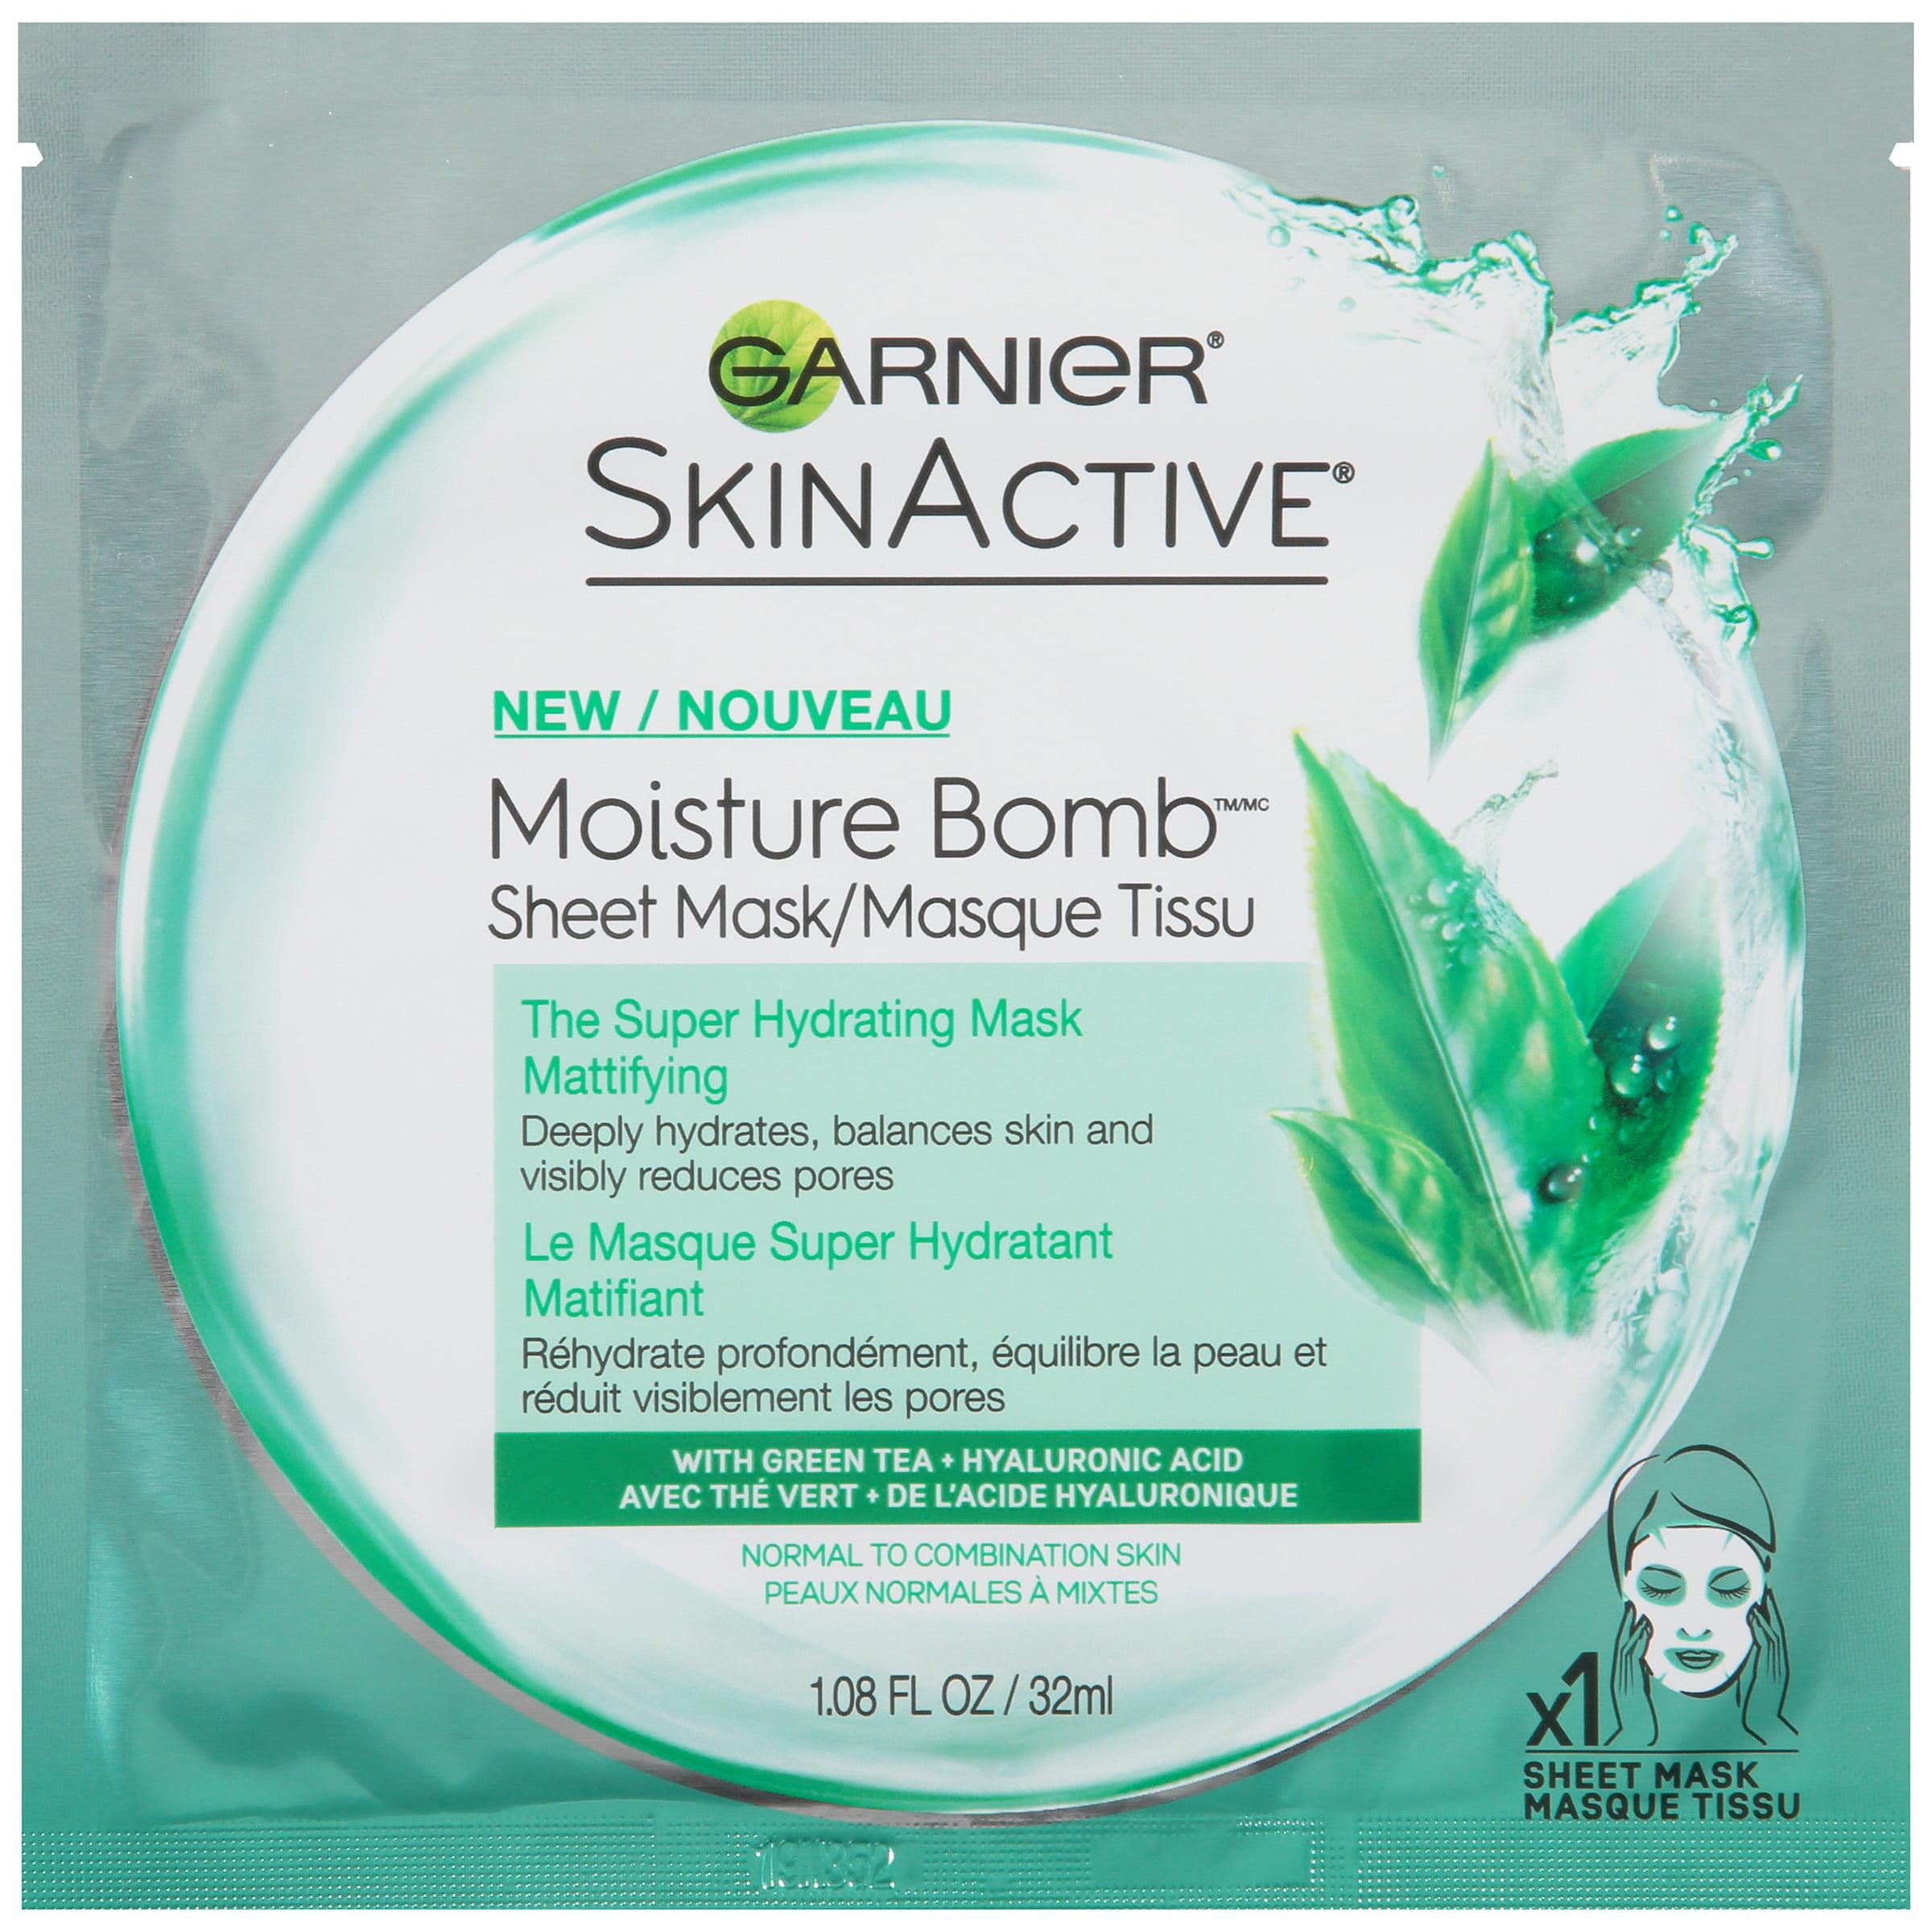 Garnier SkinActive Moisture Bomb The Super Hydrating Mattifying Sheet Mask 6 ct Pack